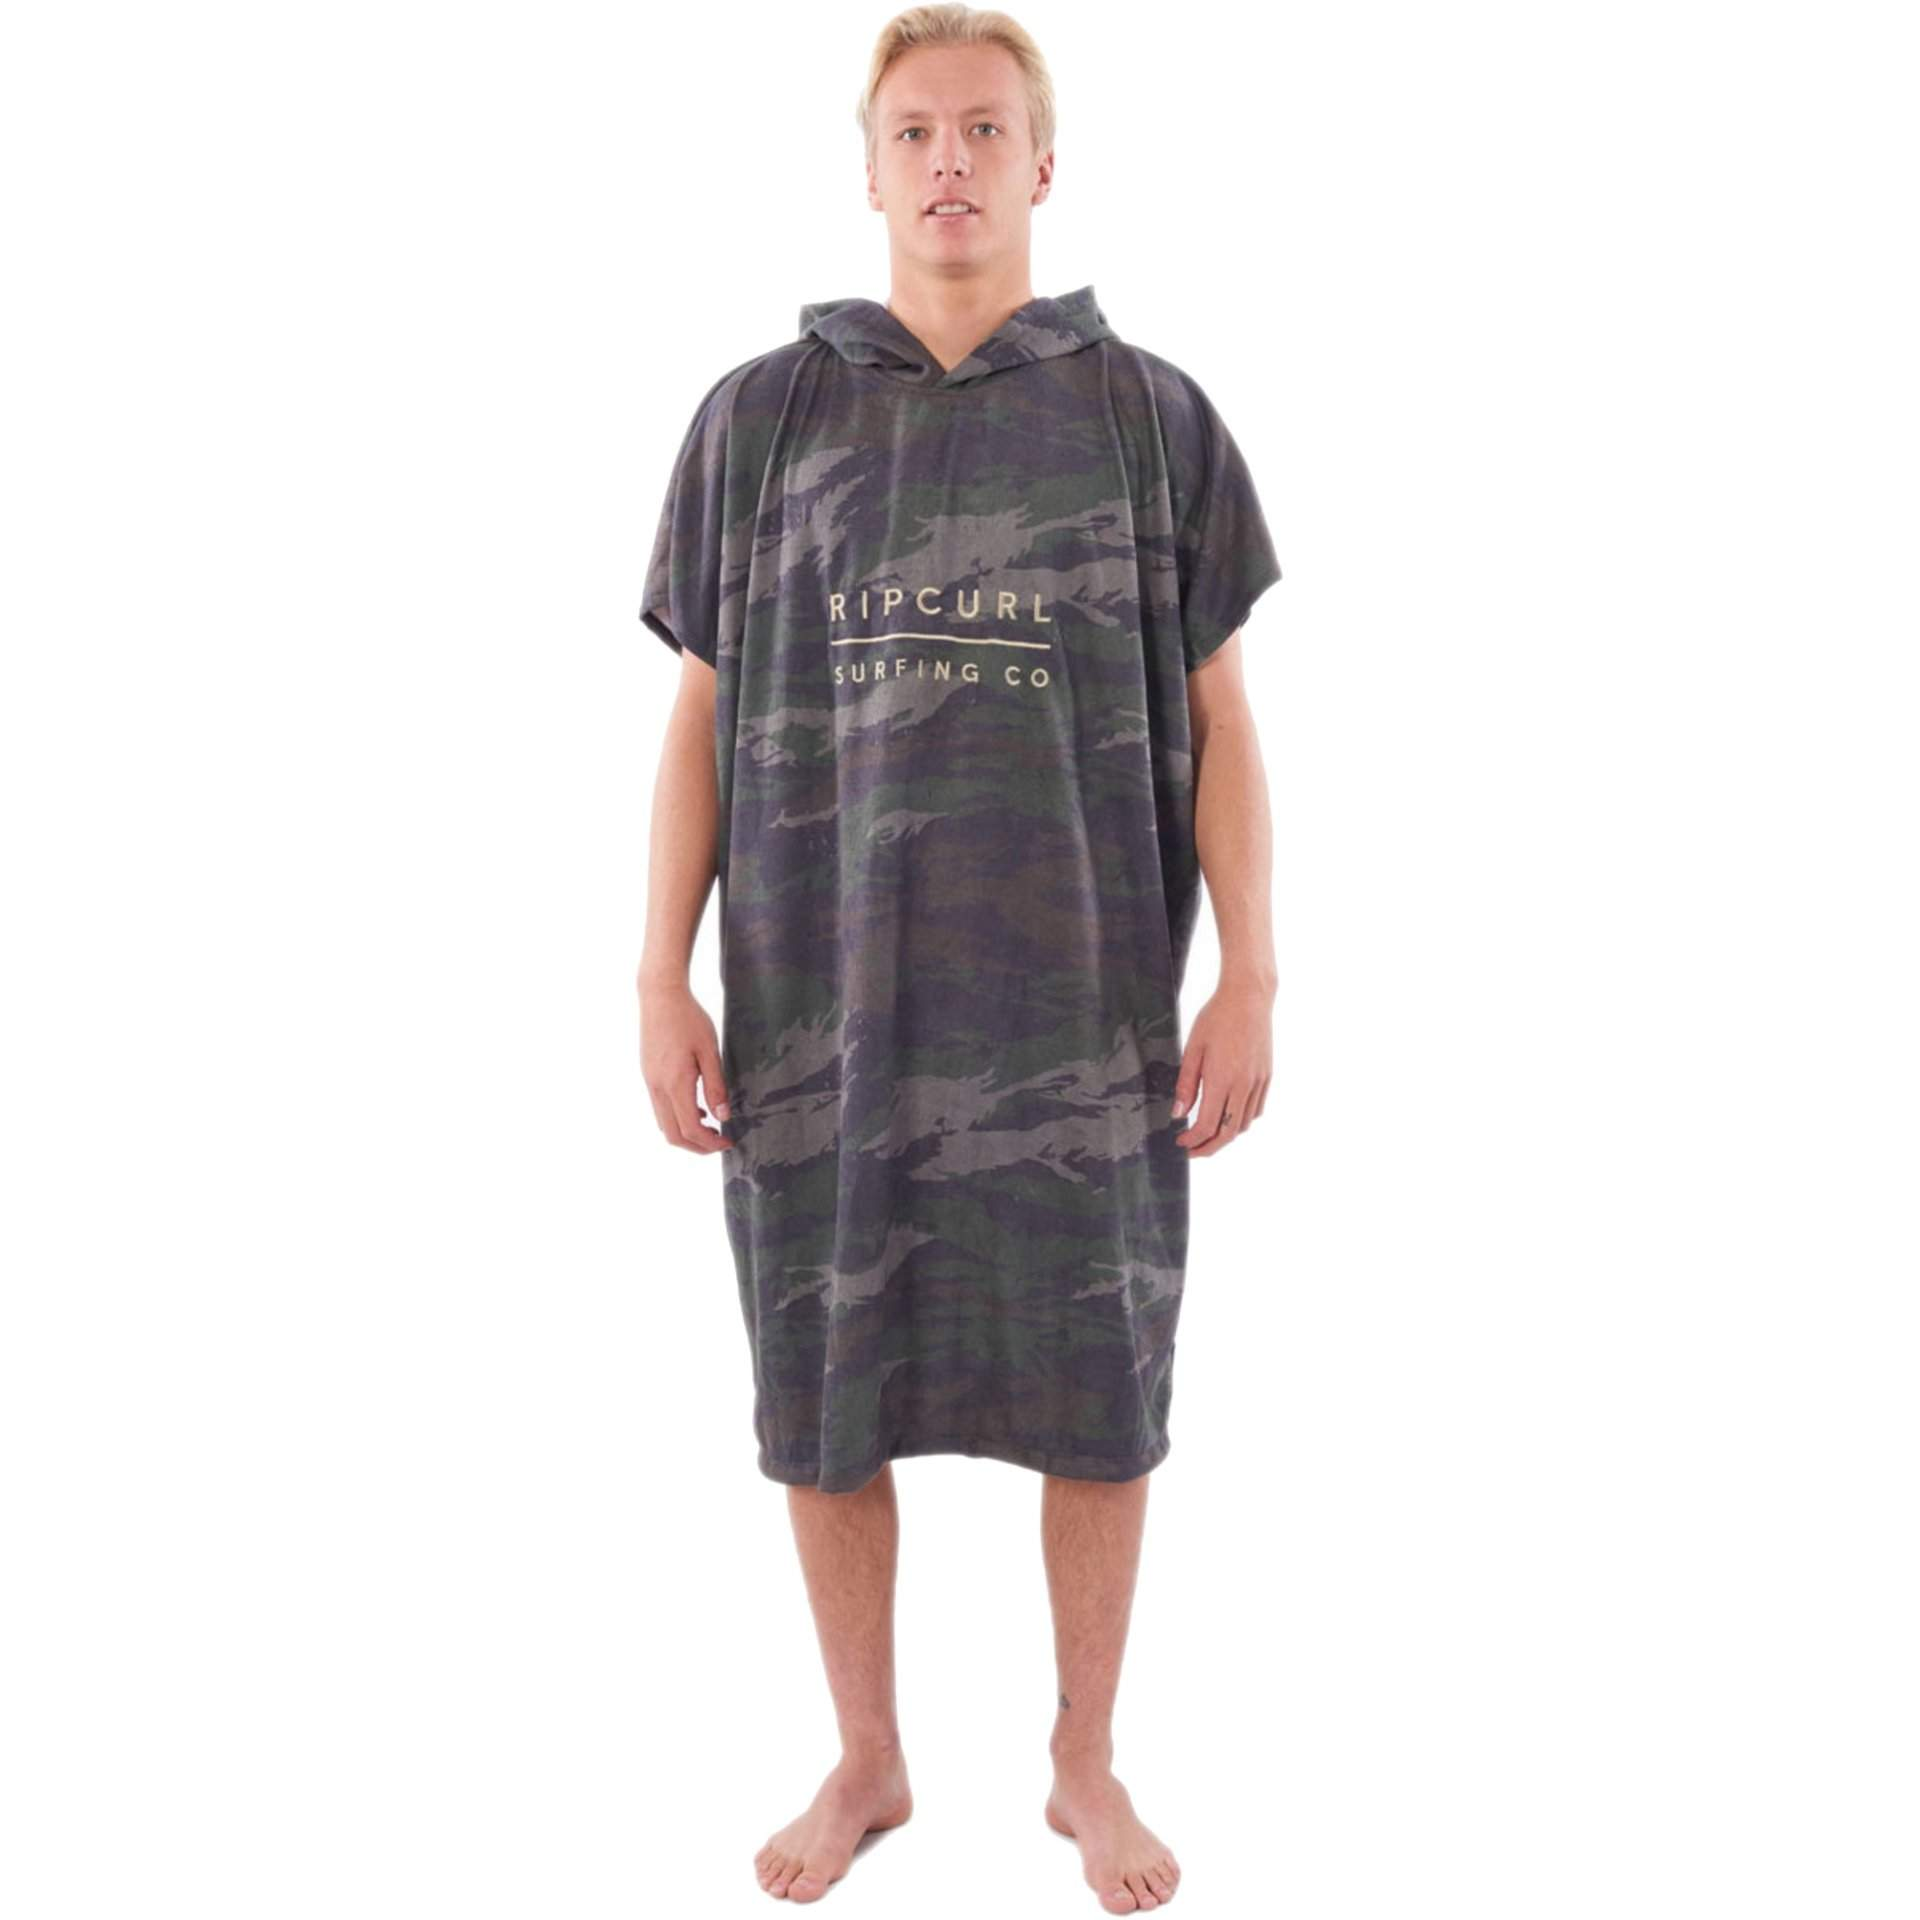 PONCHO RĘCZNIK RIP CURL MIX UP HOODED TOWEL CTWAH9 60 GREEN